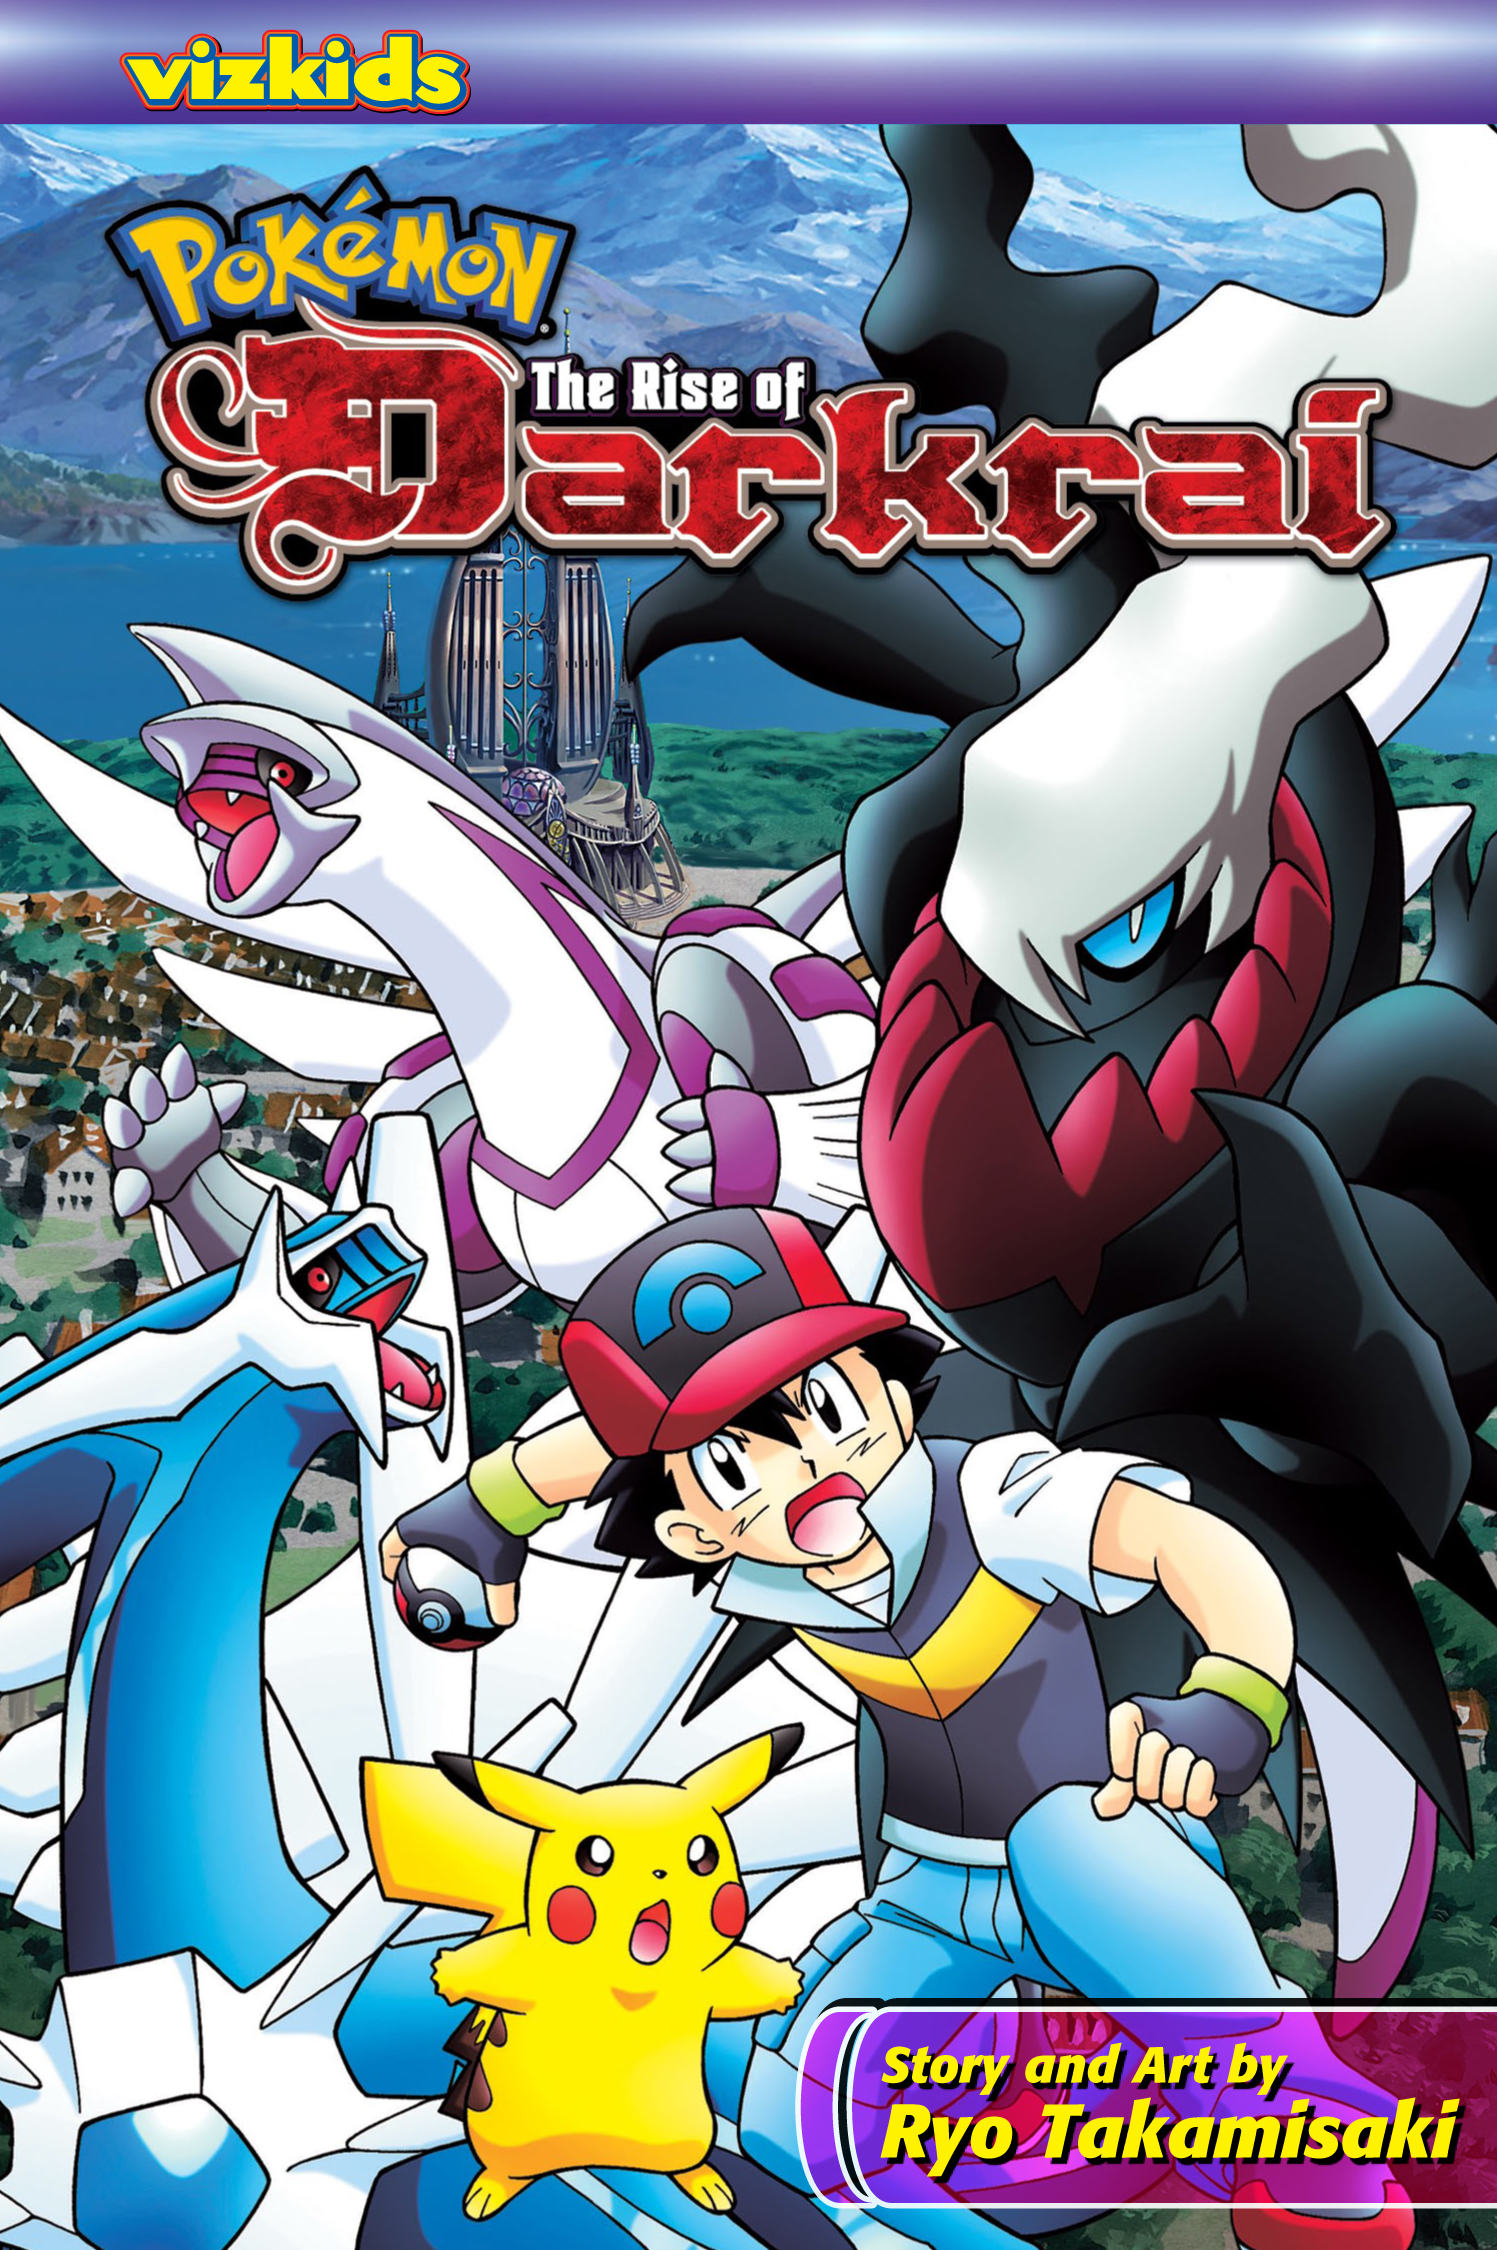 pokémon: the rise of darkrai | book by ryo takamisaki | official